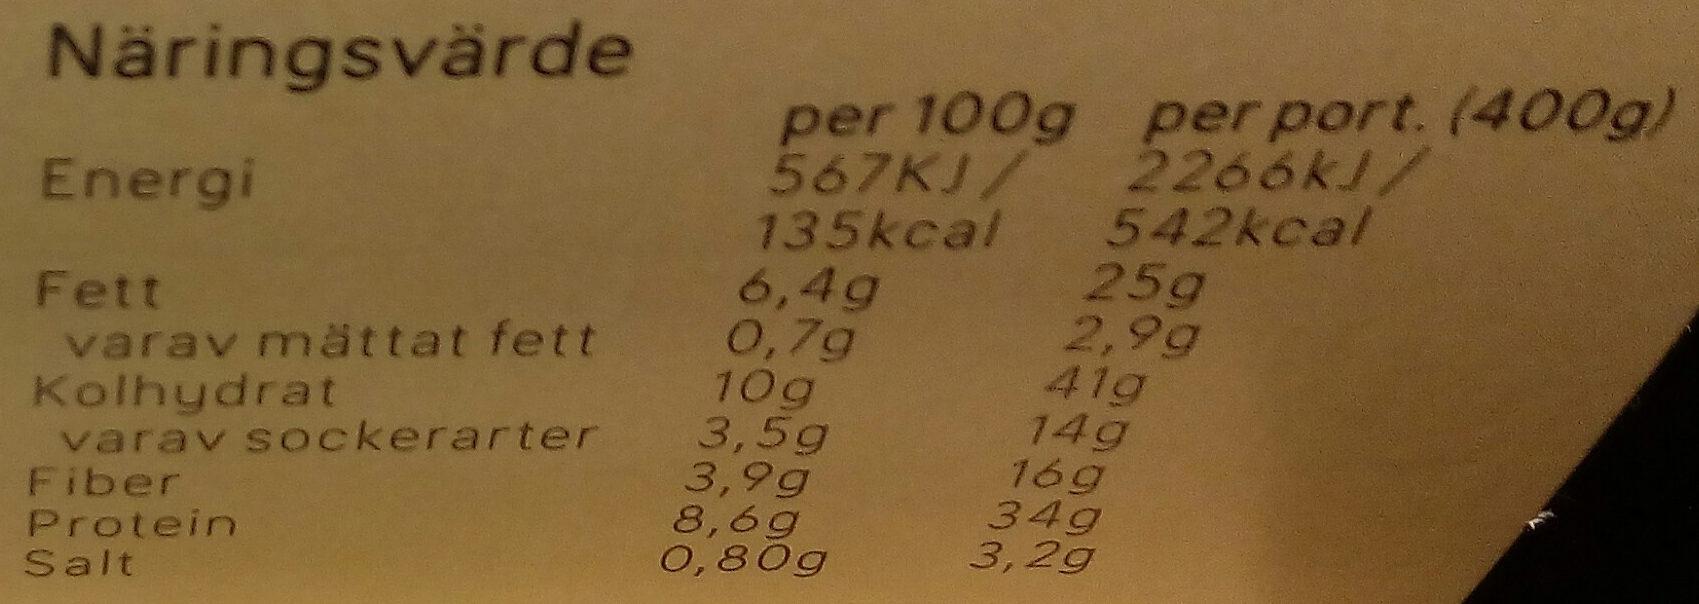 Dafgårds Ärtig falafel - Nutrition facts